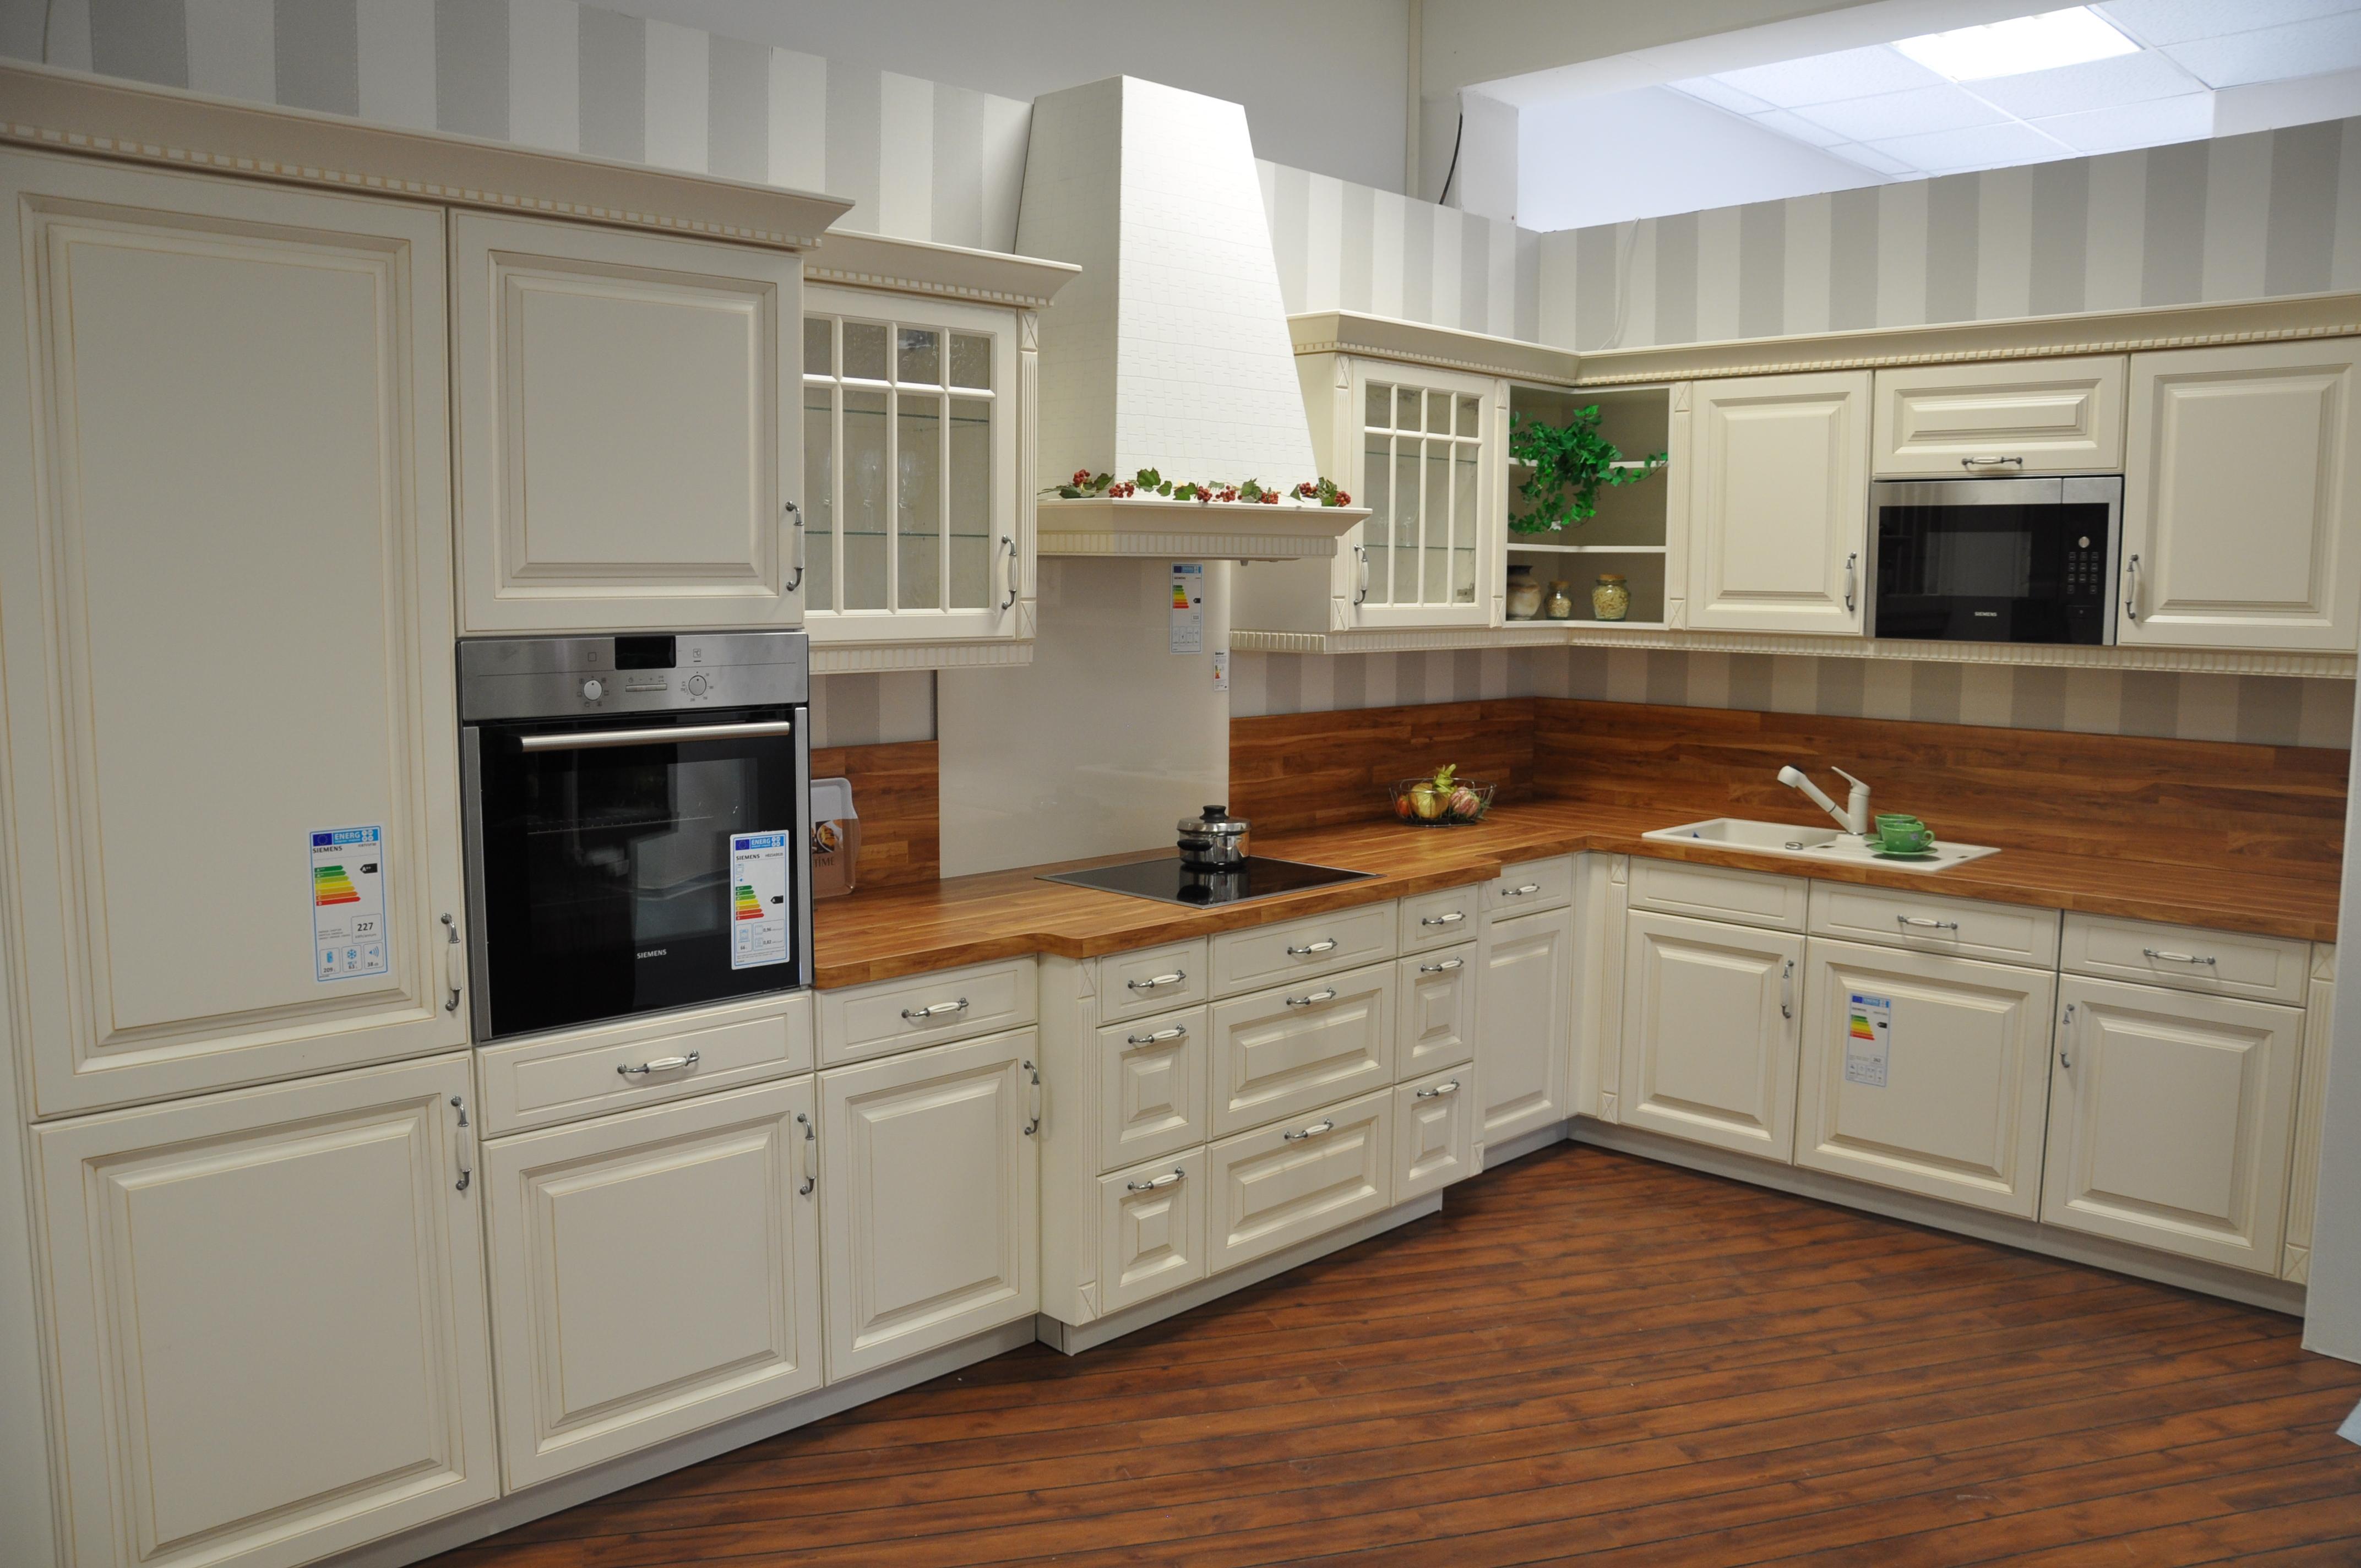 hoco k chen rostock unsere k chenausstellung. Black Bedroom Furniture Sets. Home Design Ideas